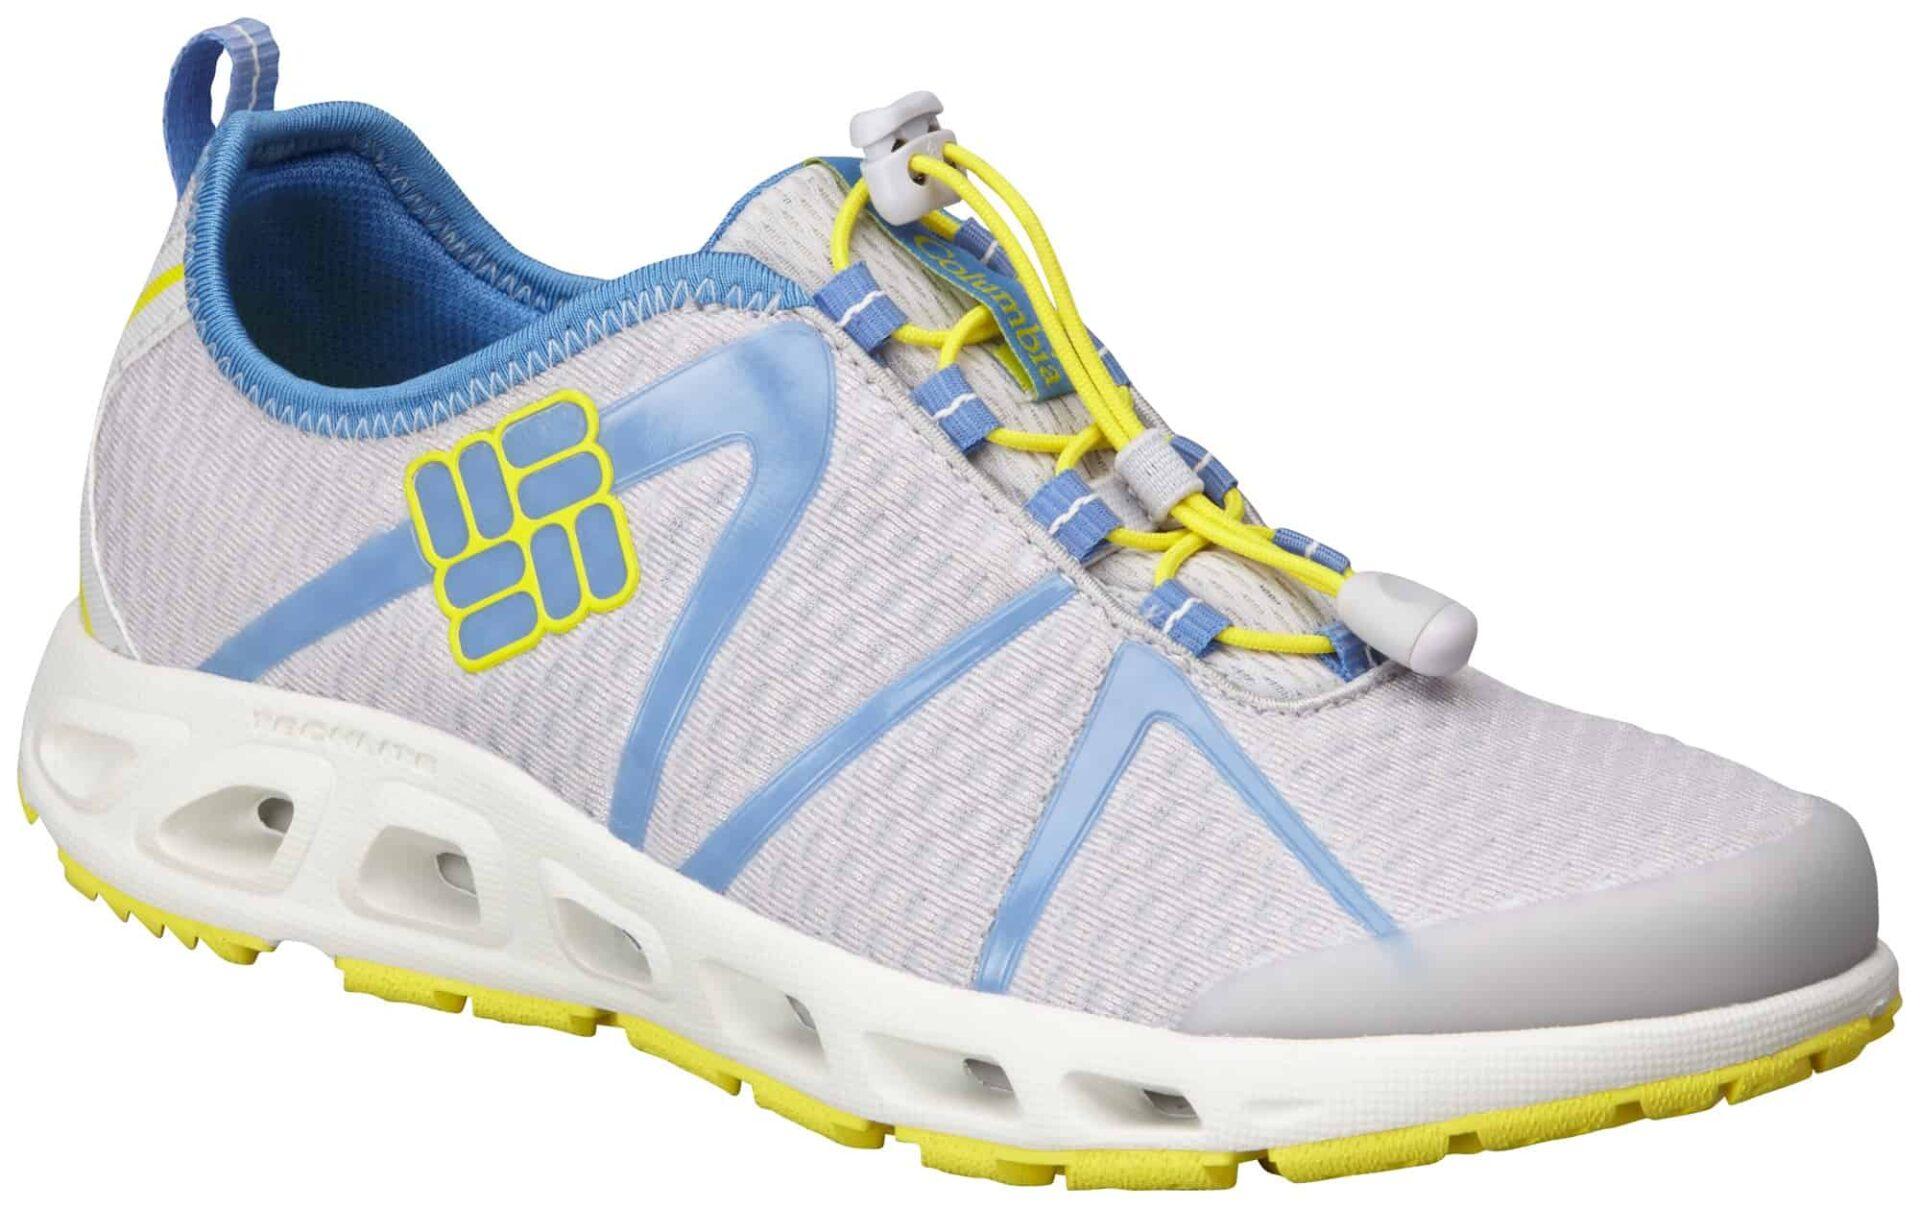 Powerdrain Cool by Columbia : le prime scarpe che rinfrescano!